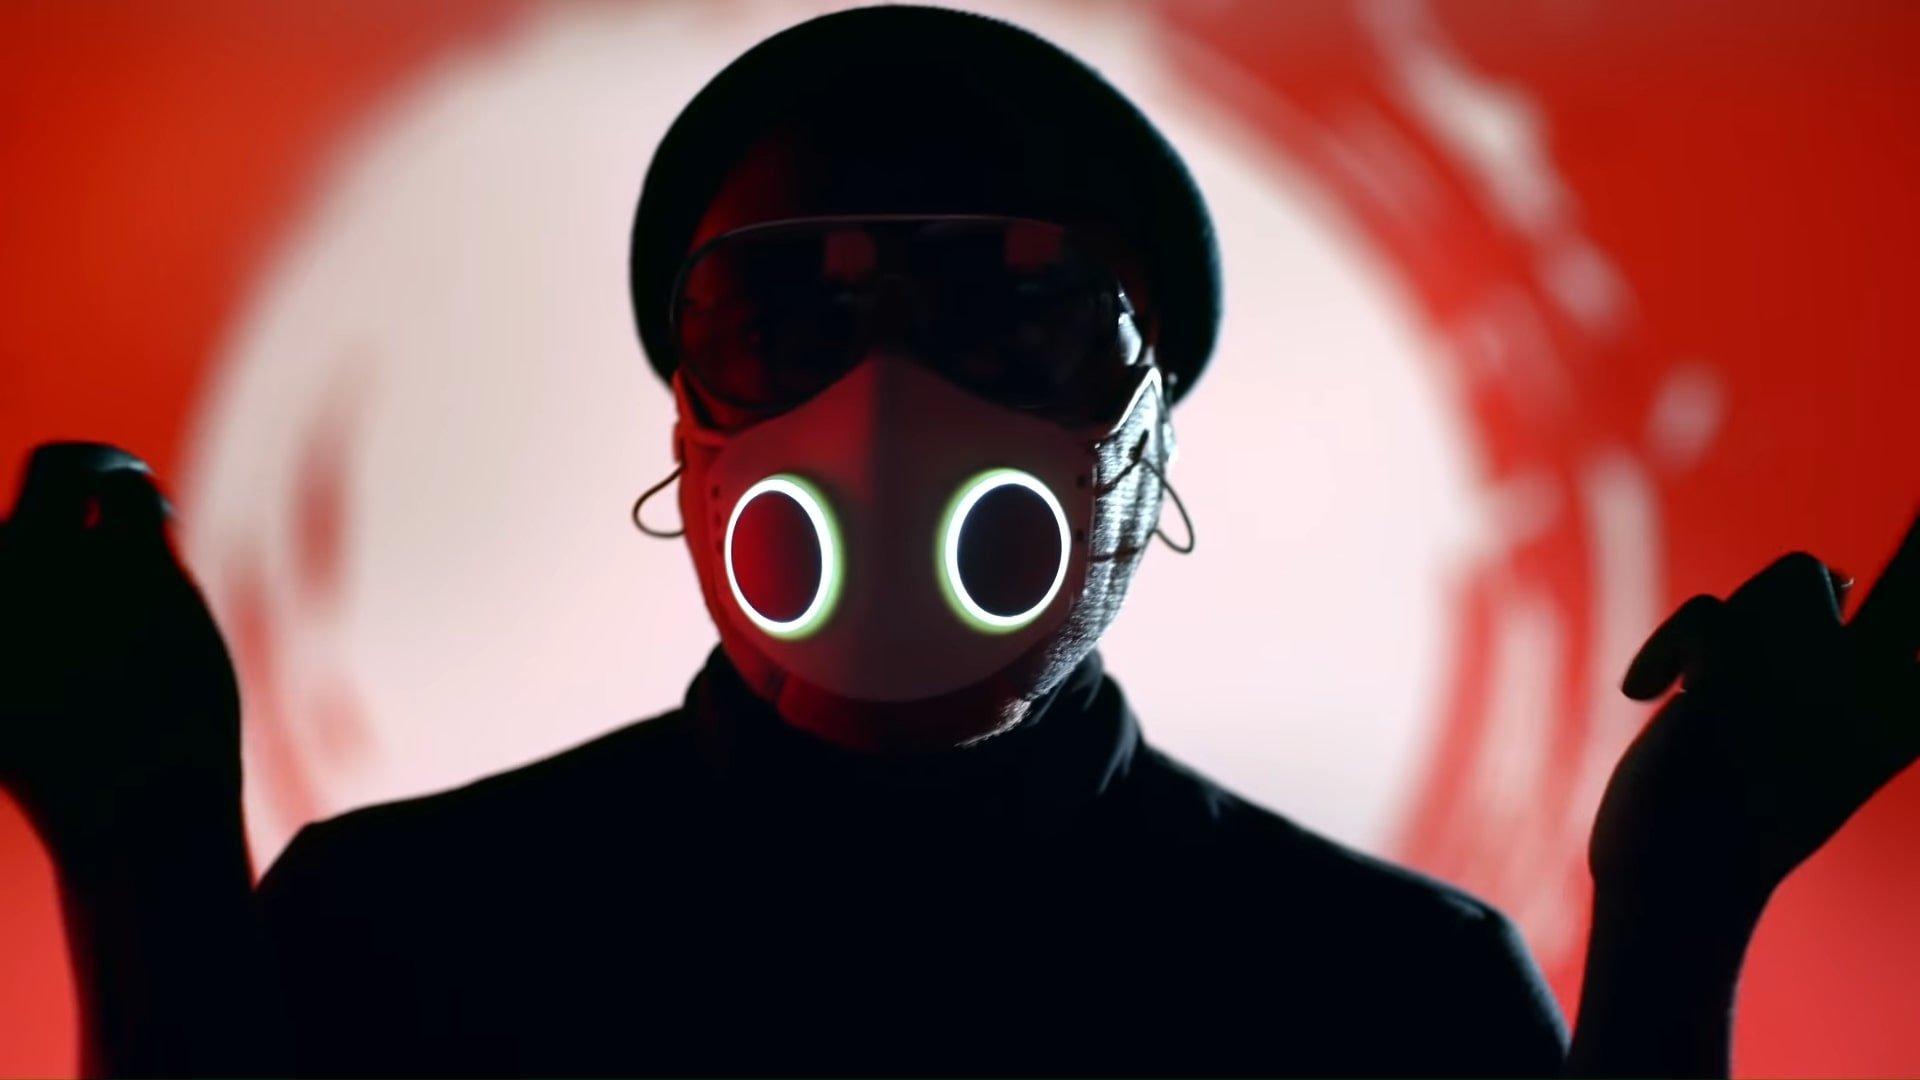 Black Eyed Peas, Shakira - GIRL LIKE ME (Official Music Video) 1-45 Screenshot